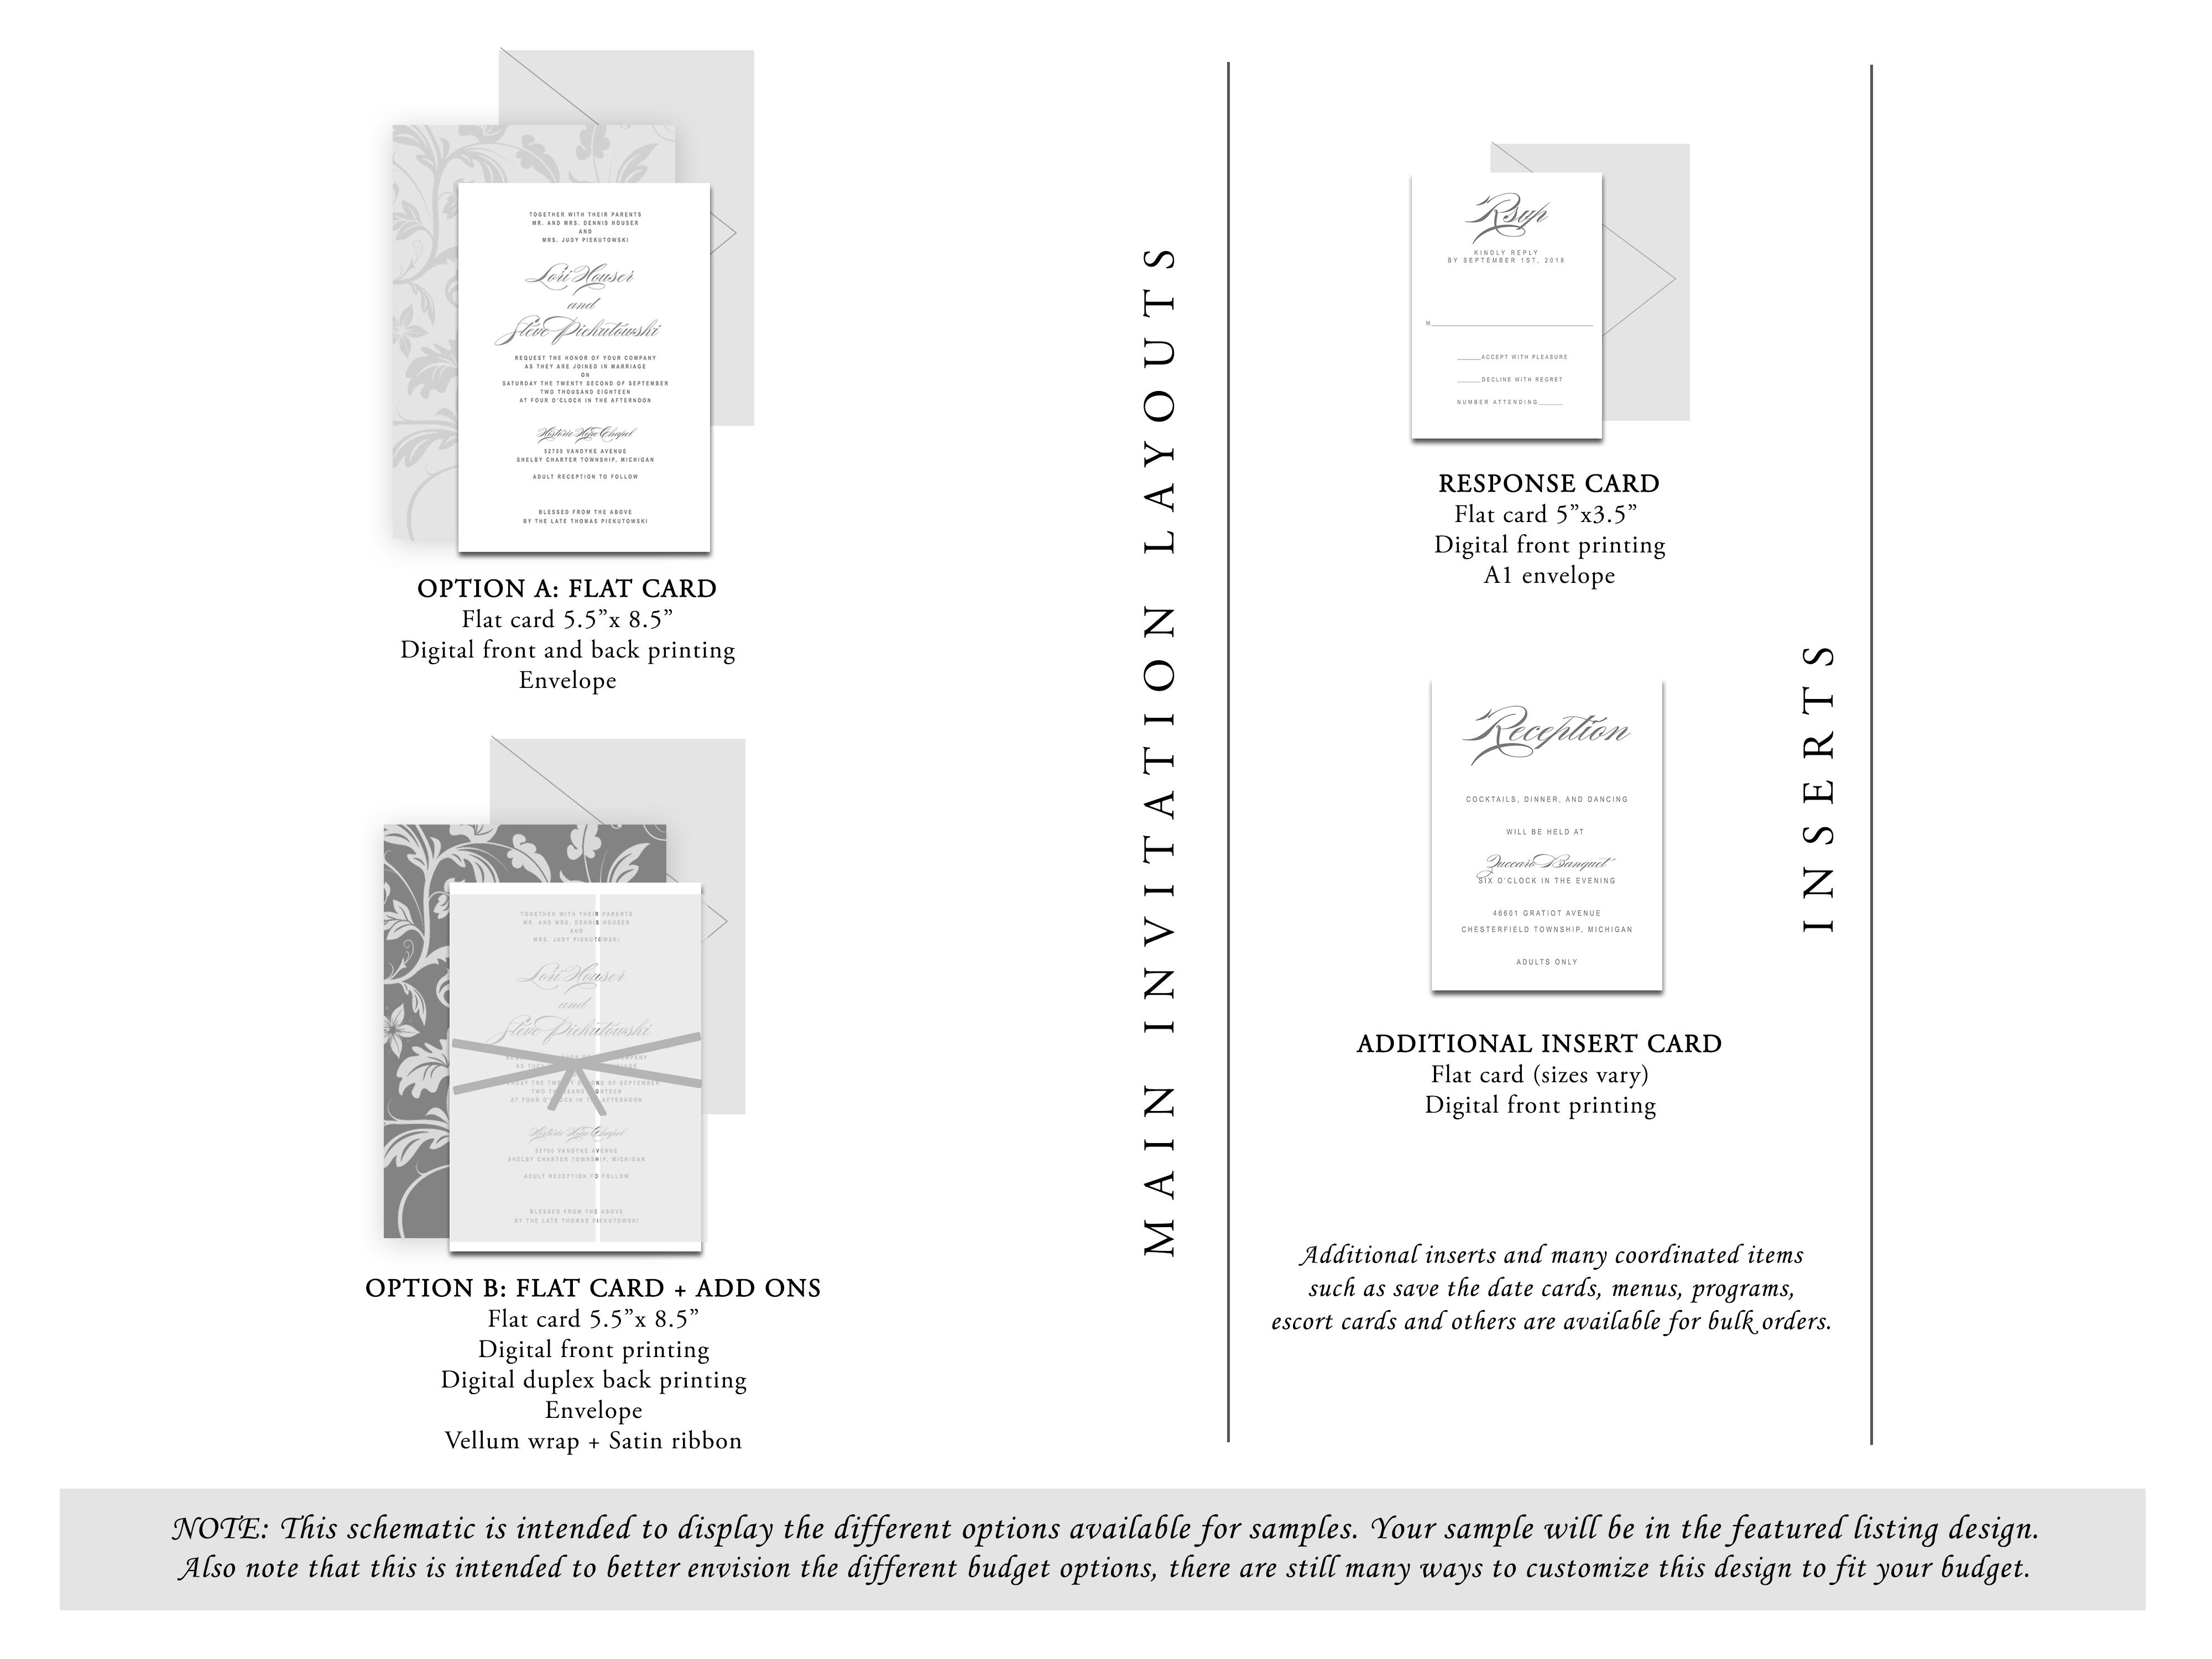 Wedding Invitations Manchester: Dark Moody Wedding Invitation {Manchester Design}